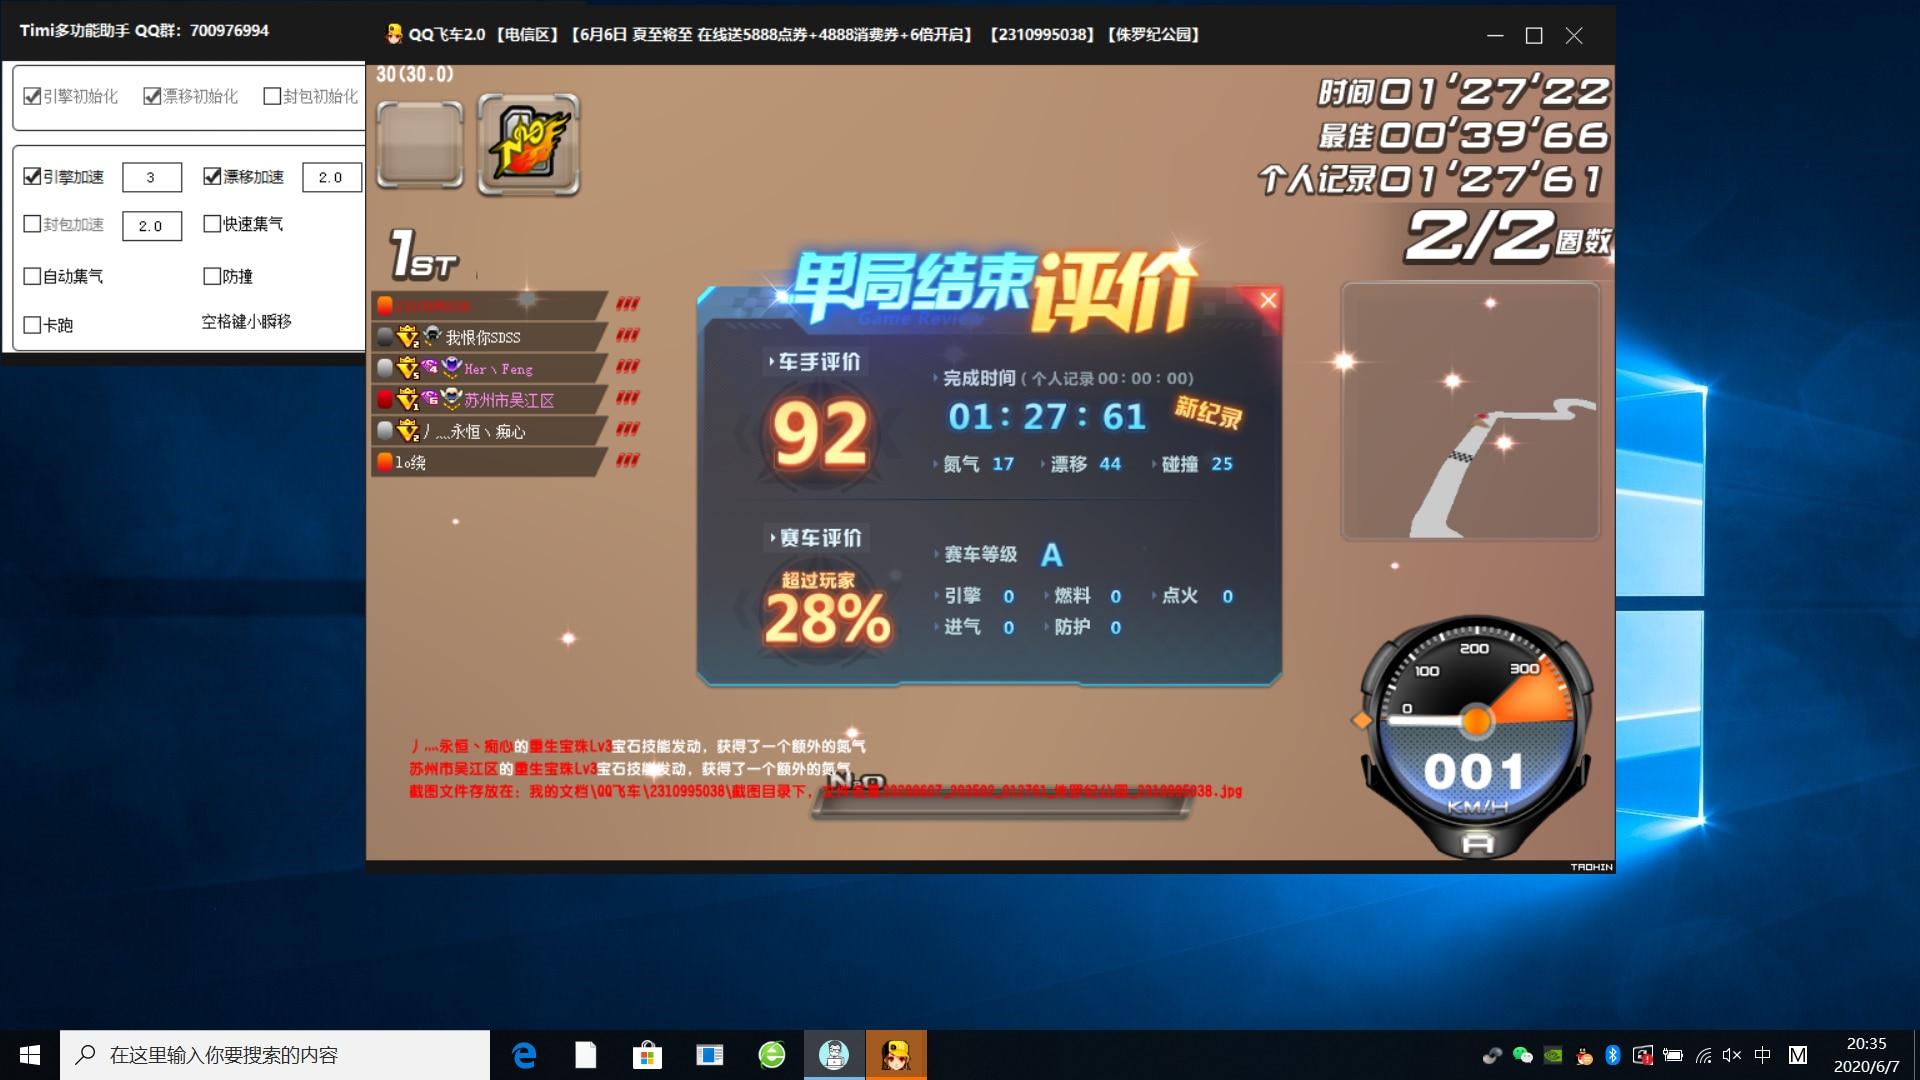 QQ飞车Timi多功能加速(边境多人大奖赛)